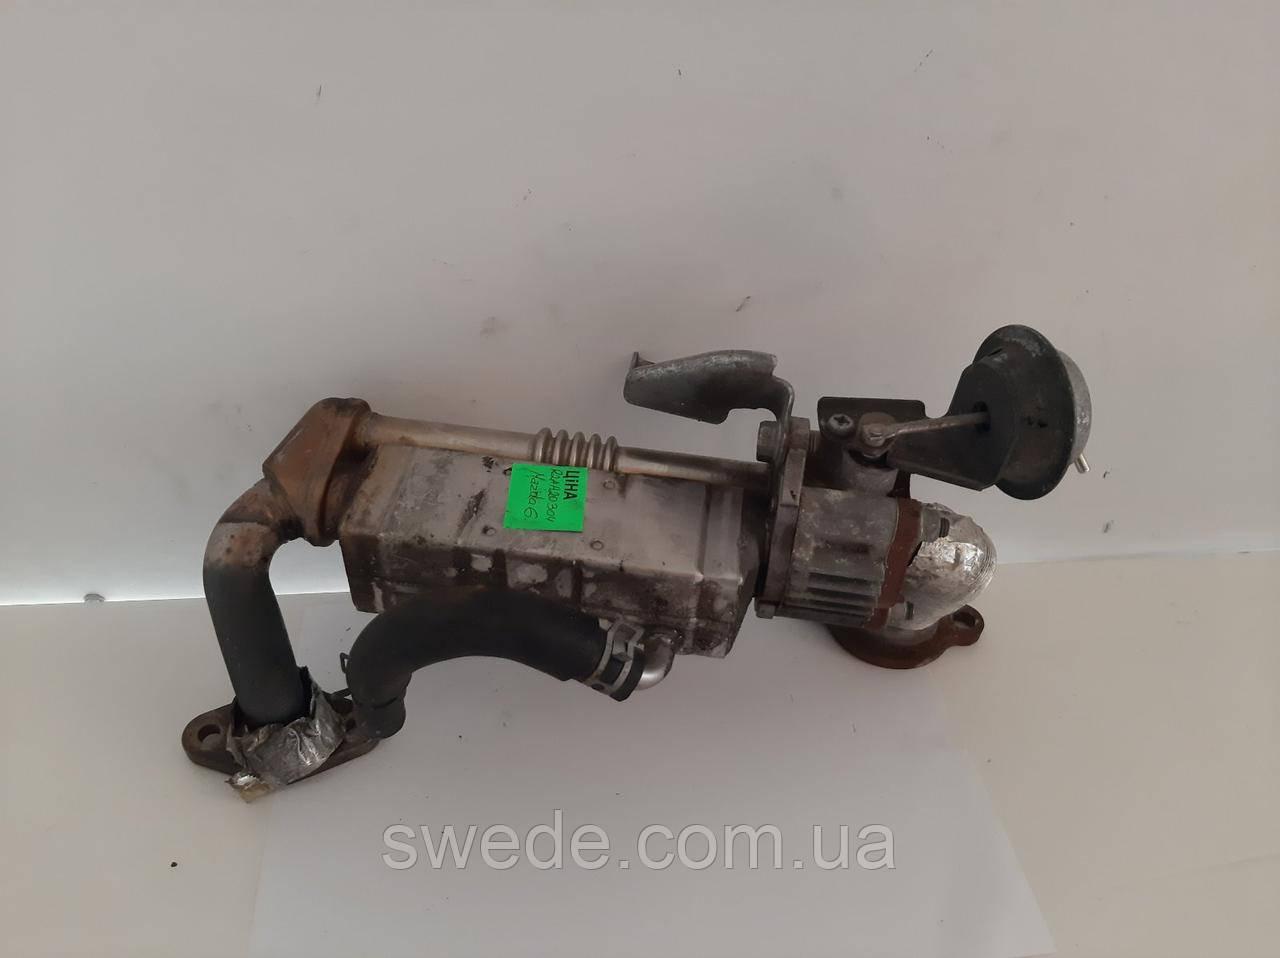 Радиатор системы EGRMazda 6 2.2 CDI 2007-2012 гг R2AA20304